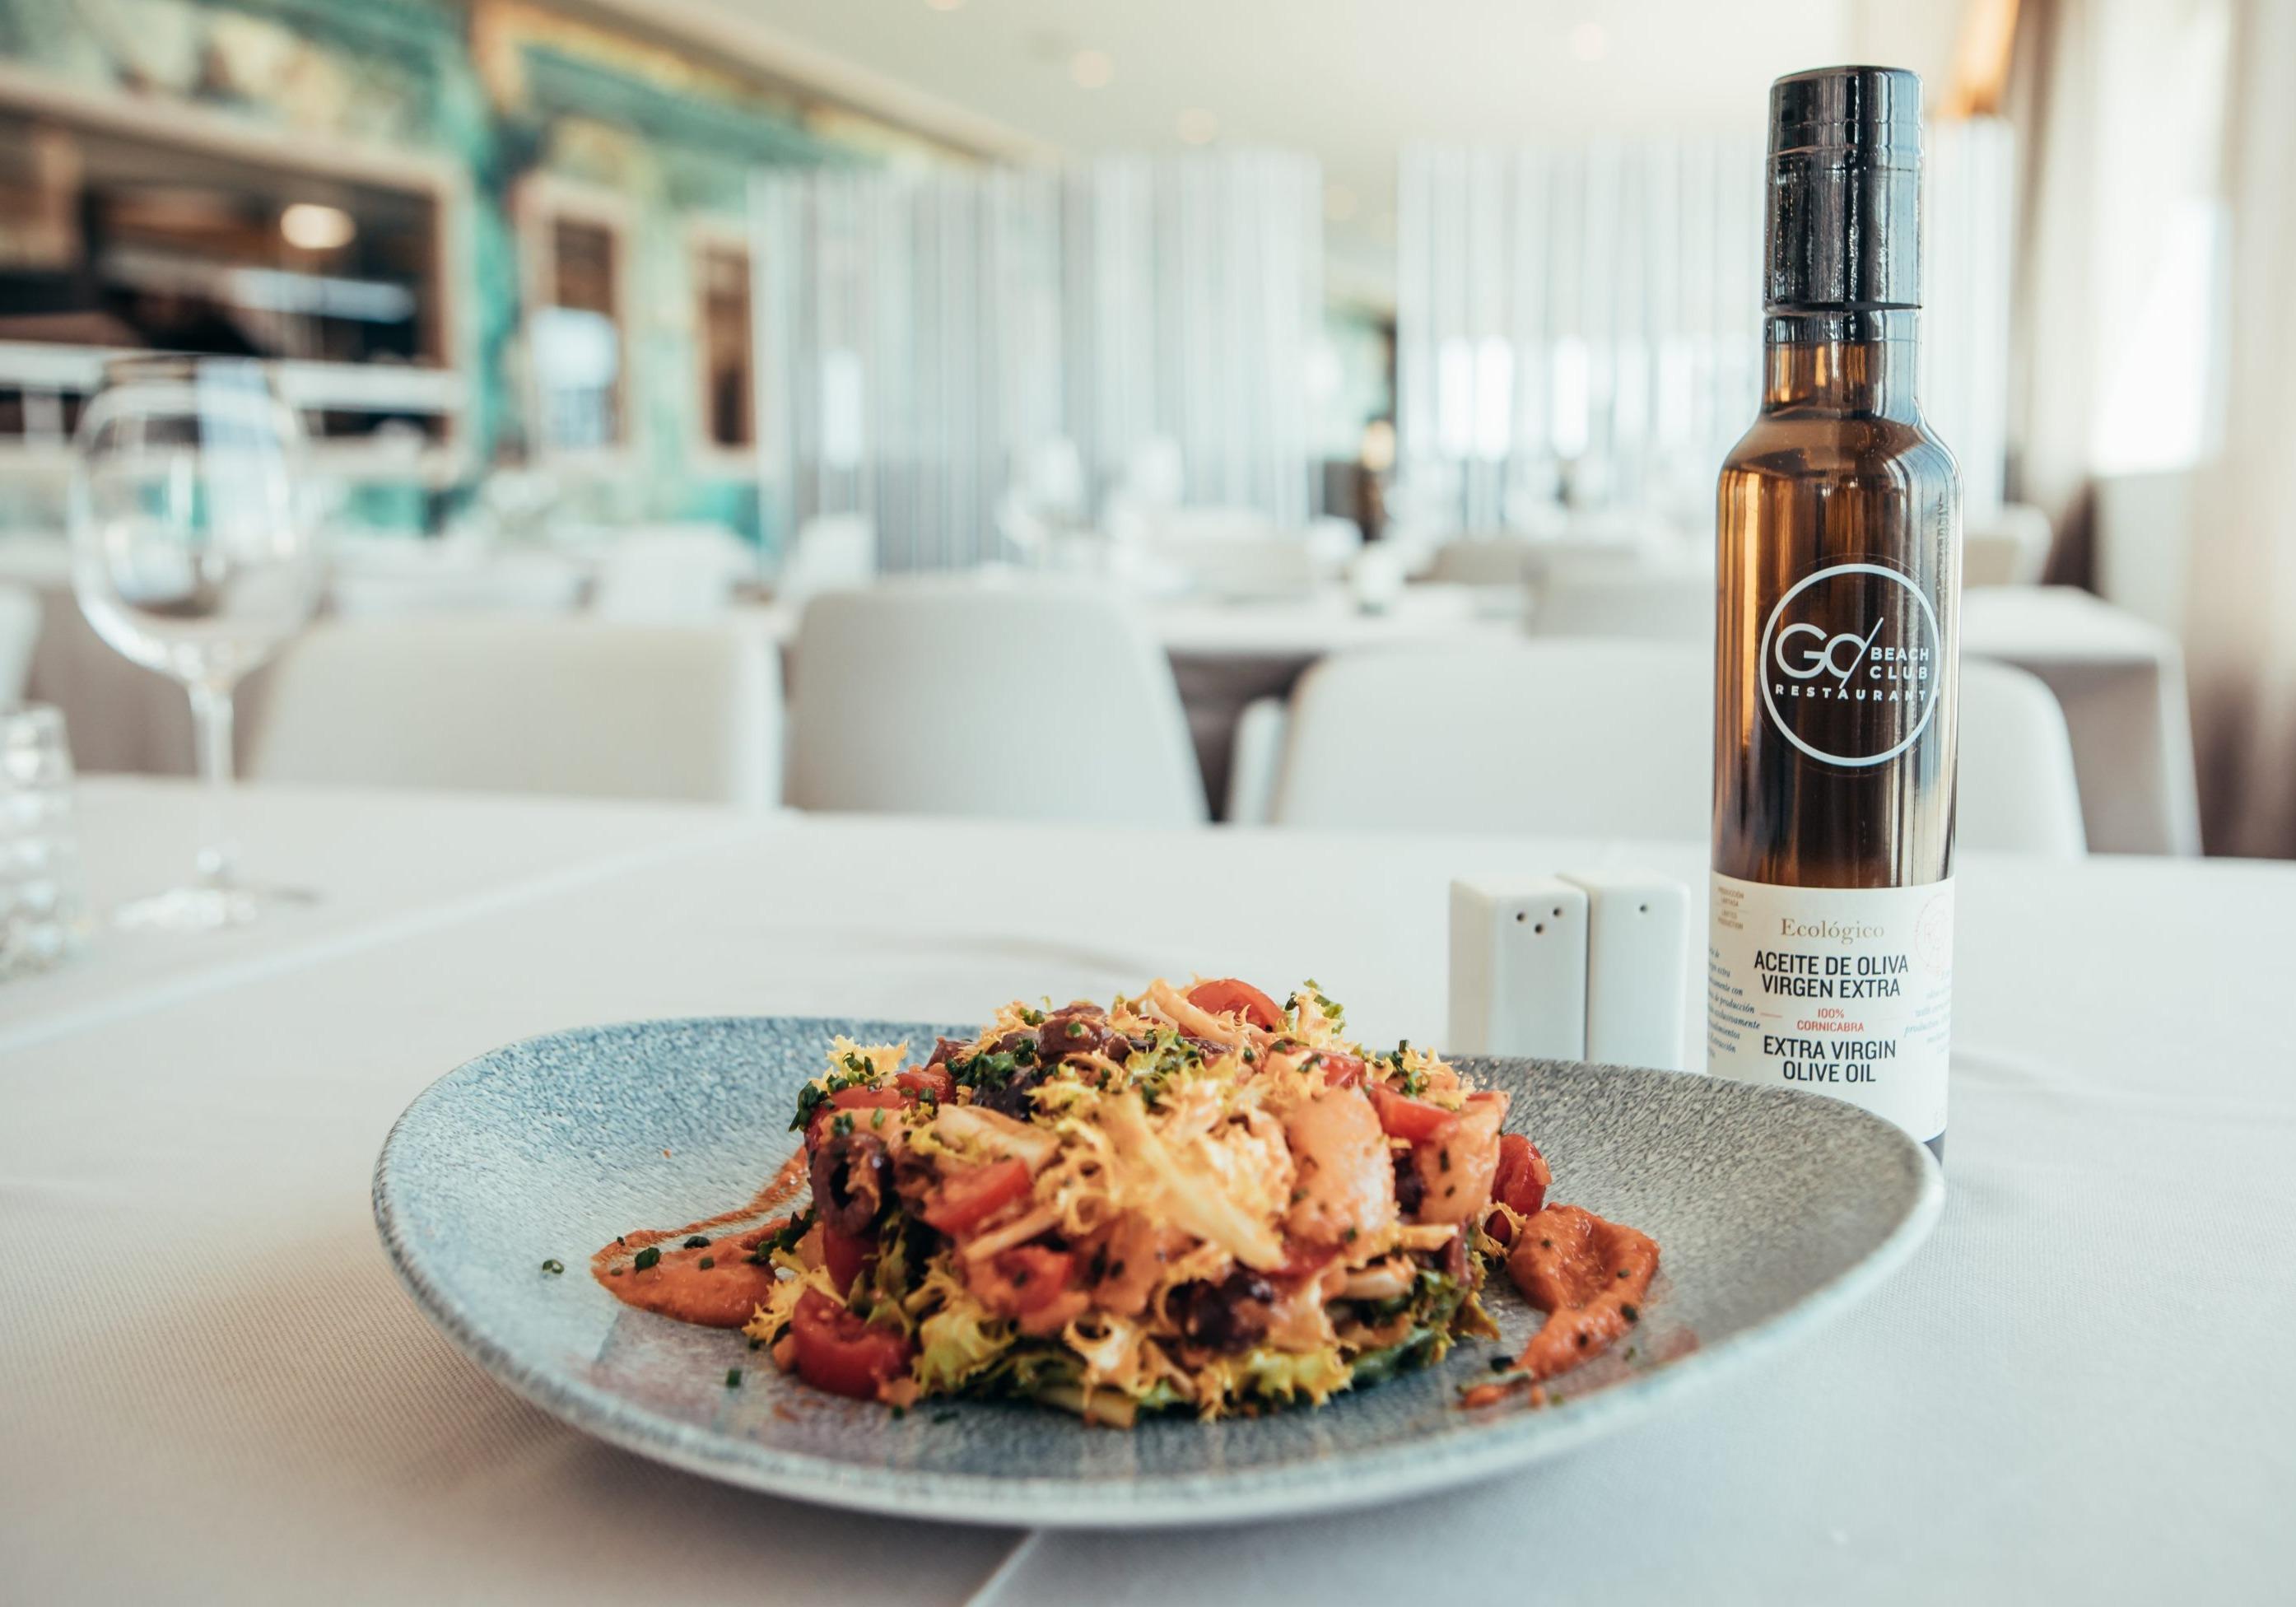 A LA CARTA @ GO RESTAURANT - Restaurant Go Beach Club Barcelona Restaurant